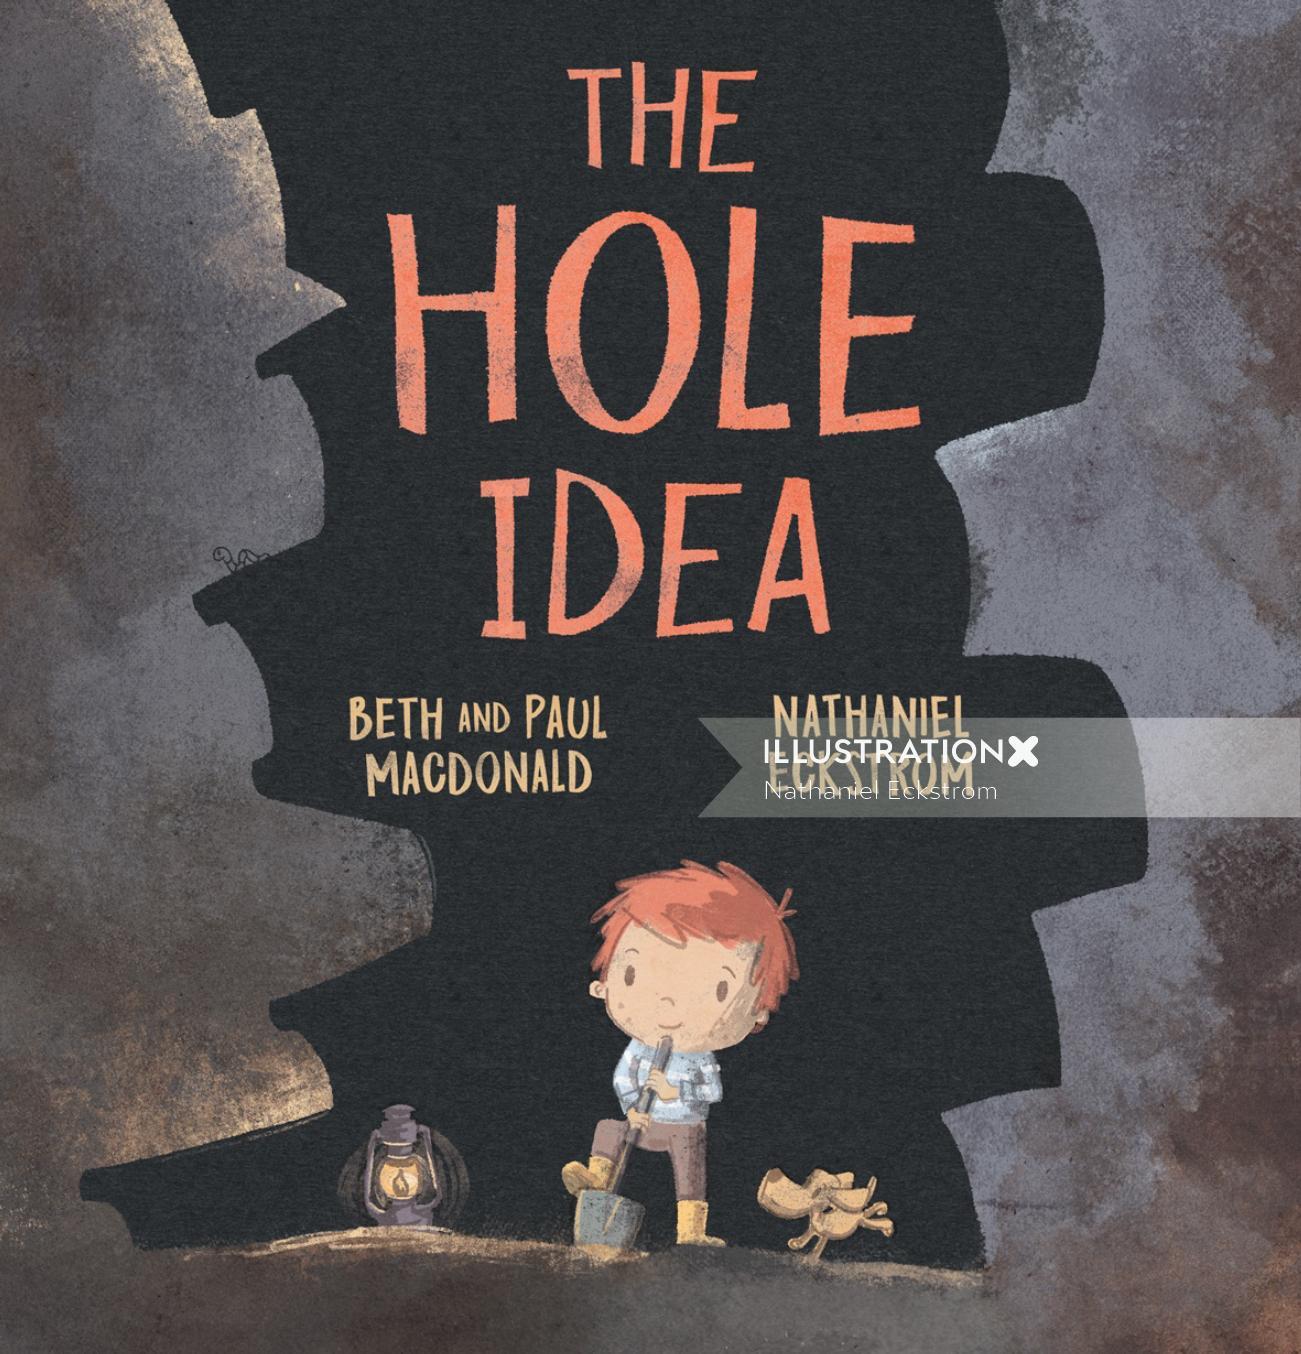 Book cover illustration of the hole idea